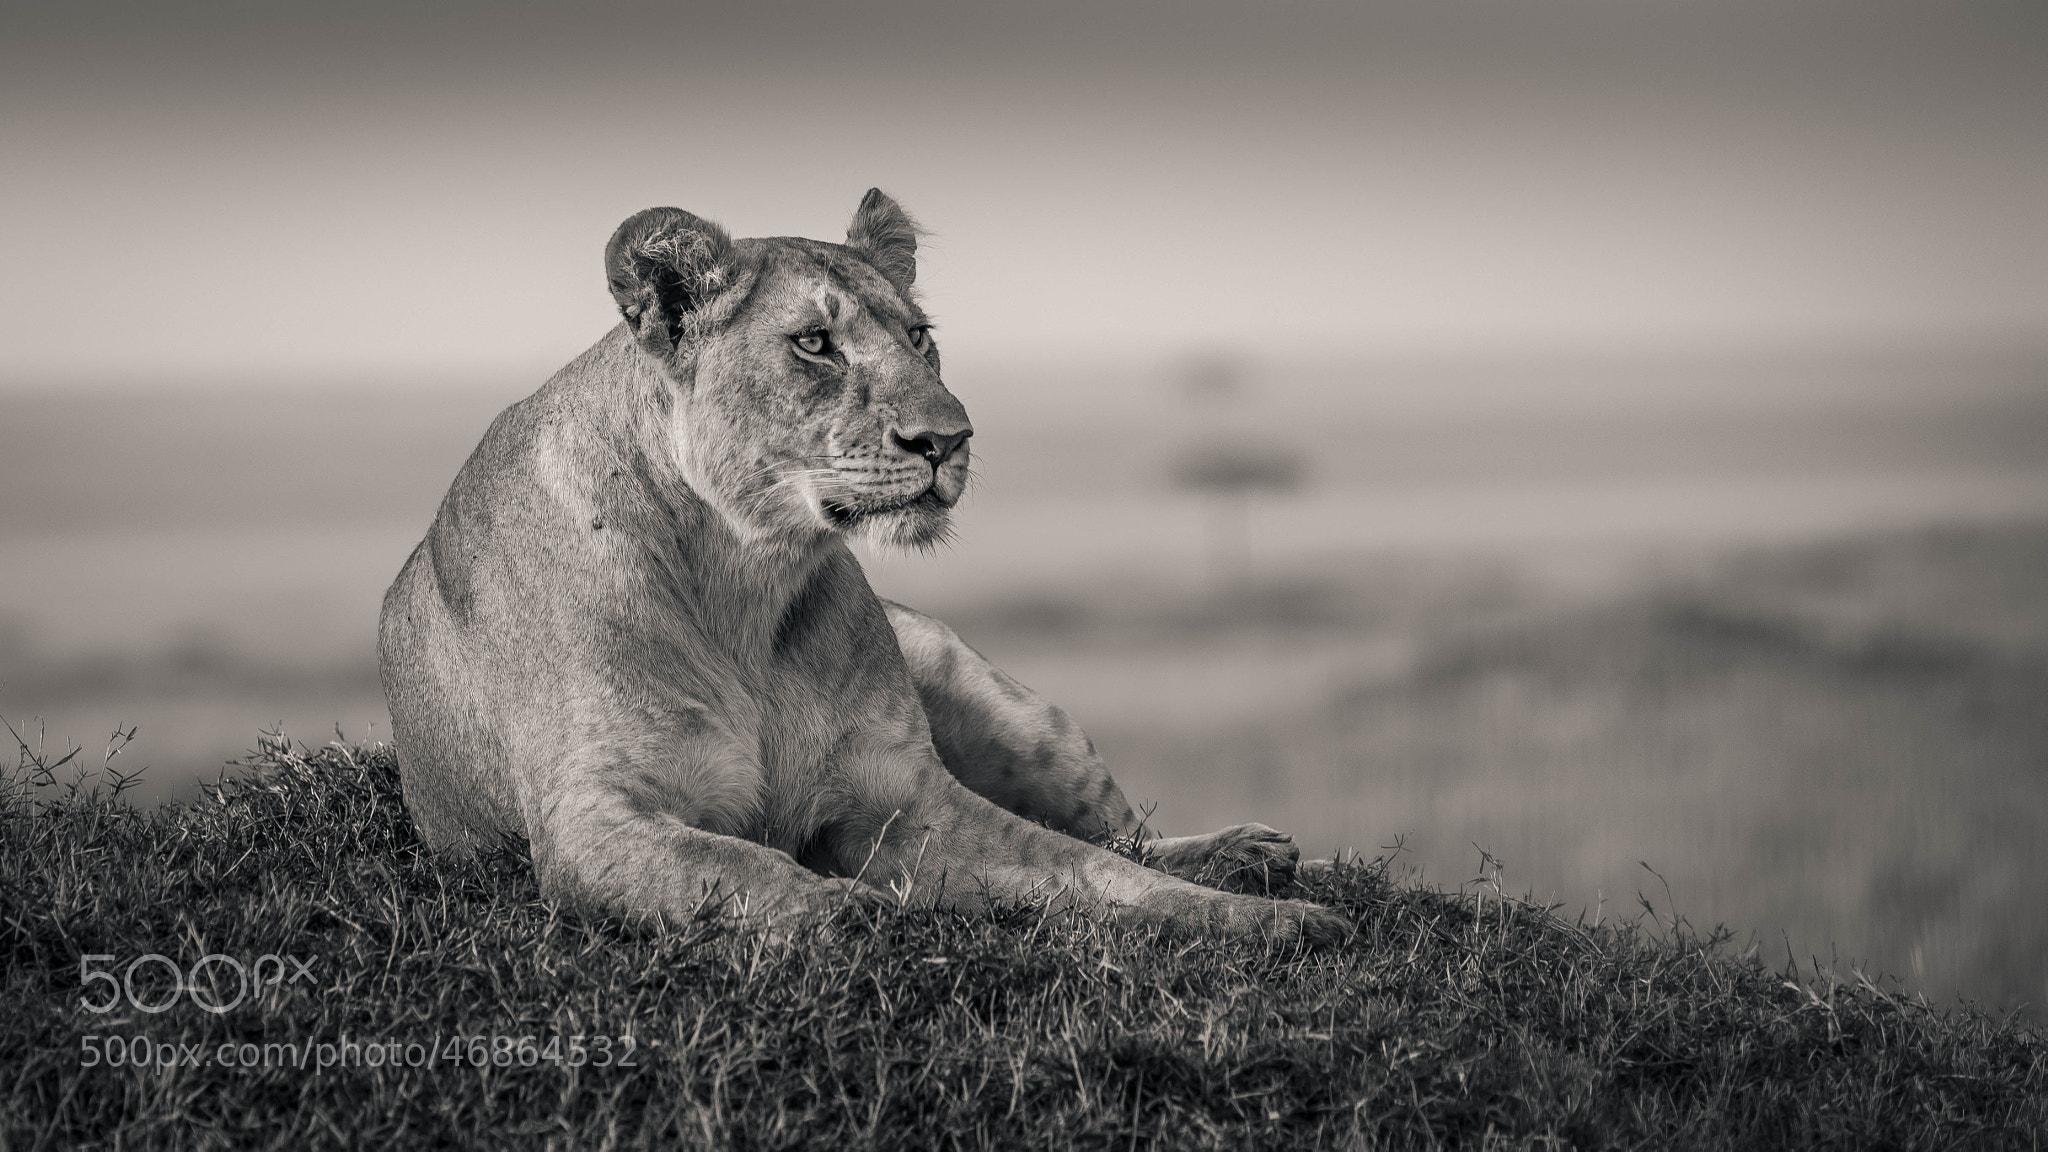 Photograph B&W Lioness by Craig Brady on 500px